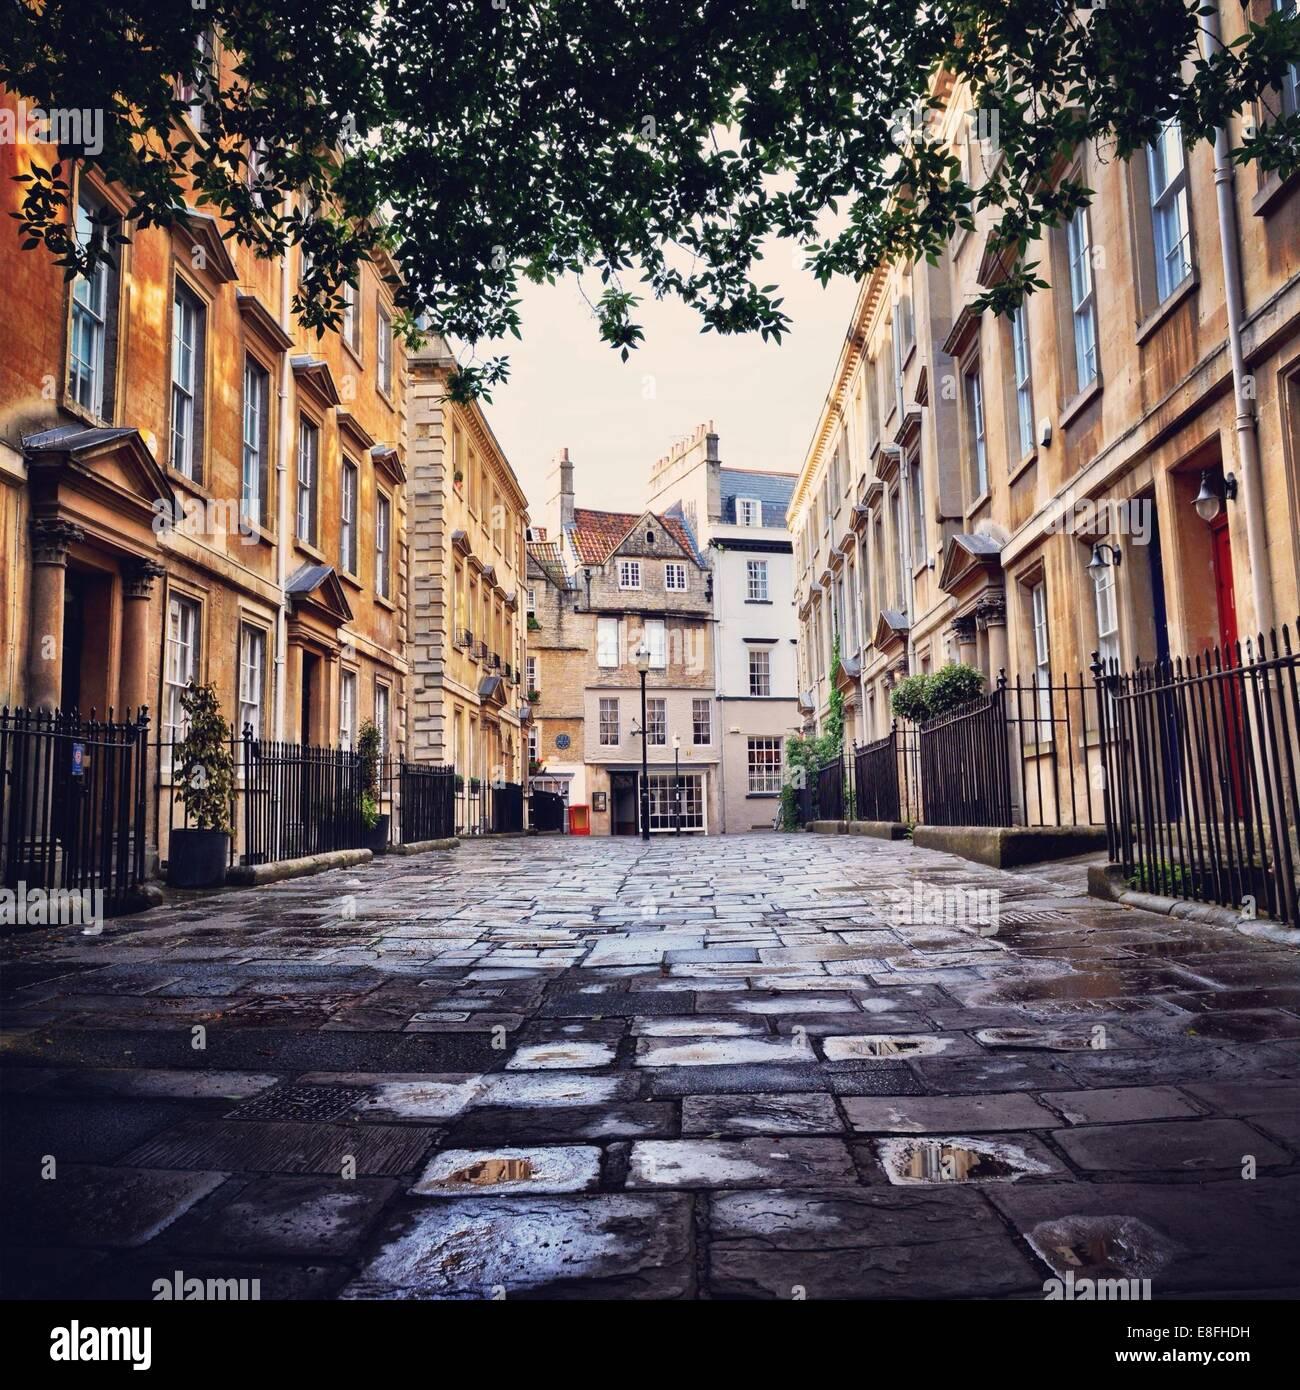 Reino Unido, Somerset, bañera, tranquilo callejón Imagen De Stock